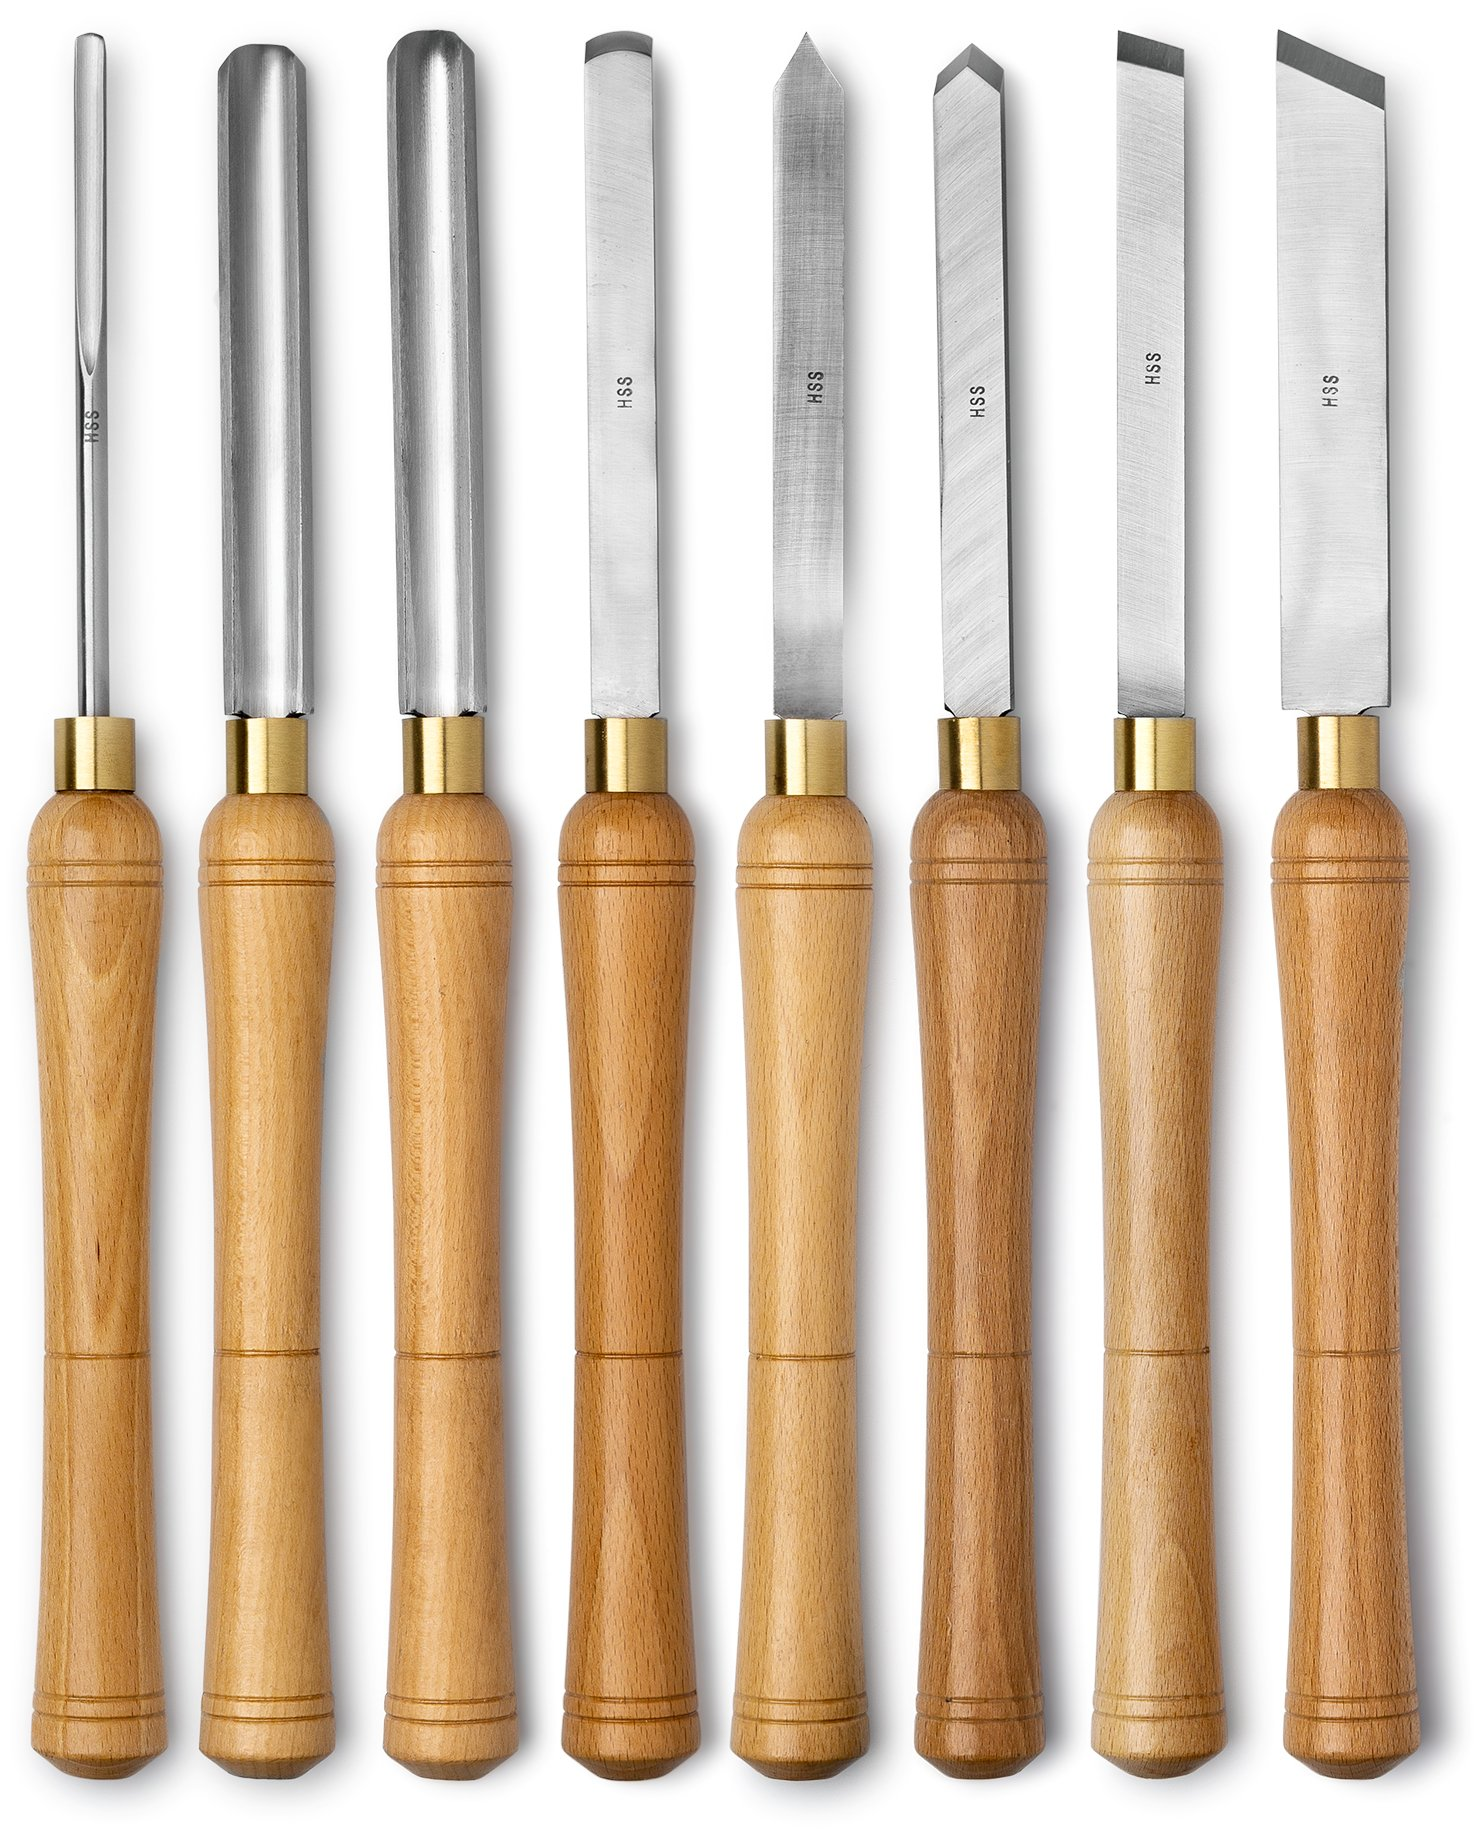 Werks Lathe Set, HSS blades, 8pc, Quality Wood Make by Werks